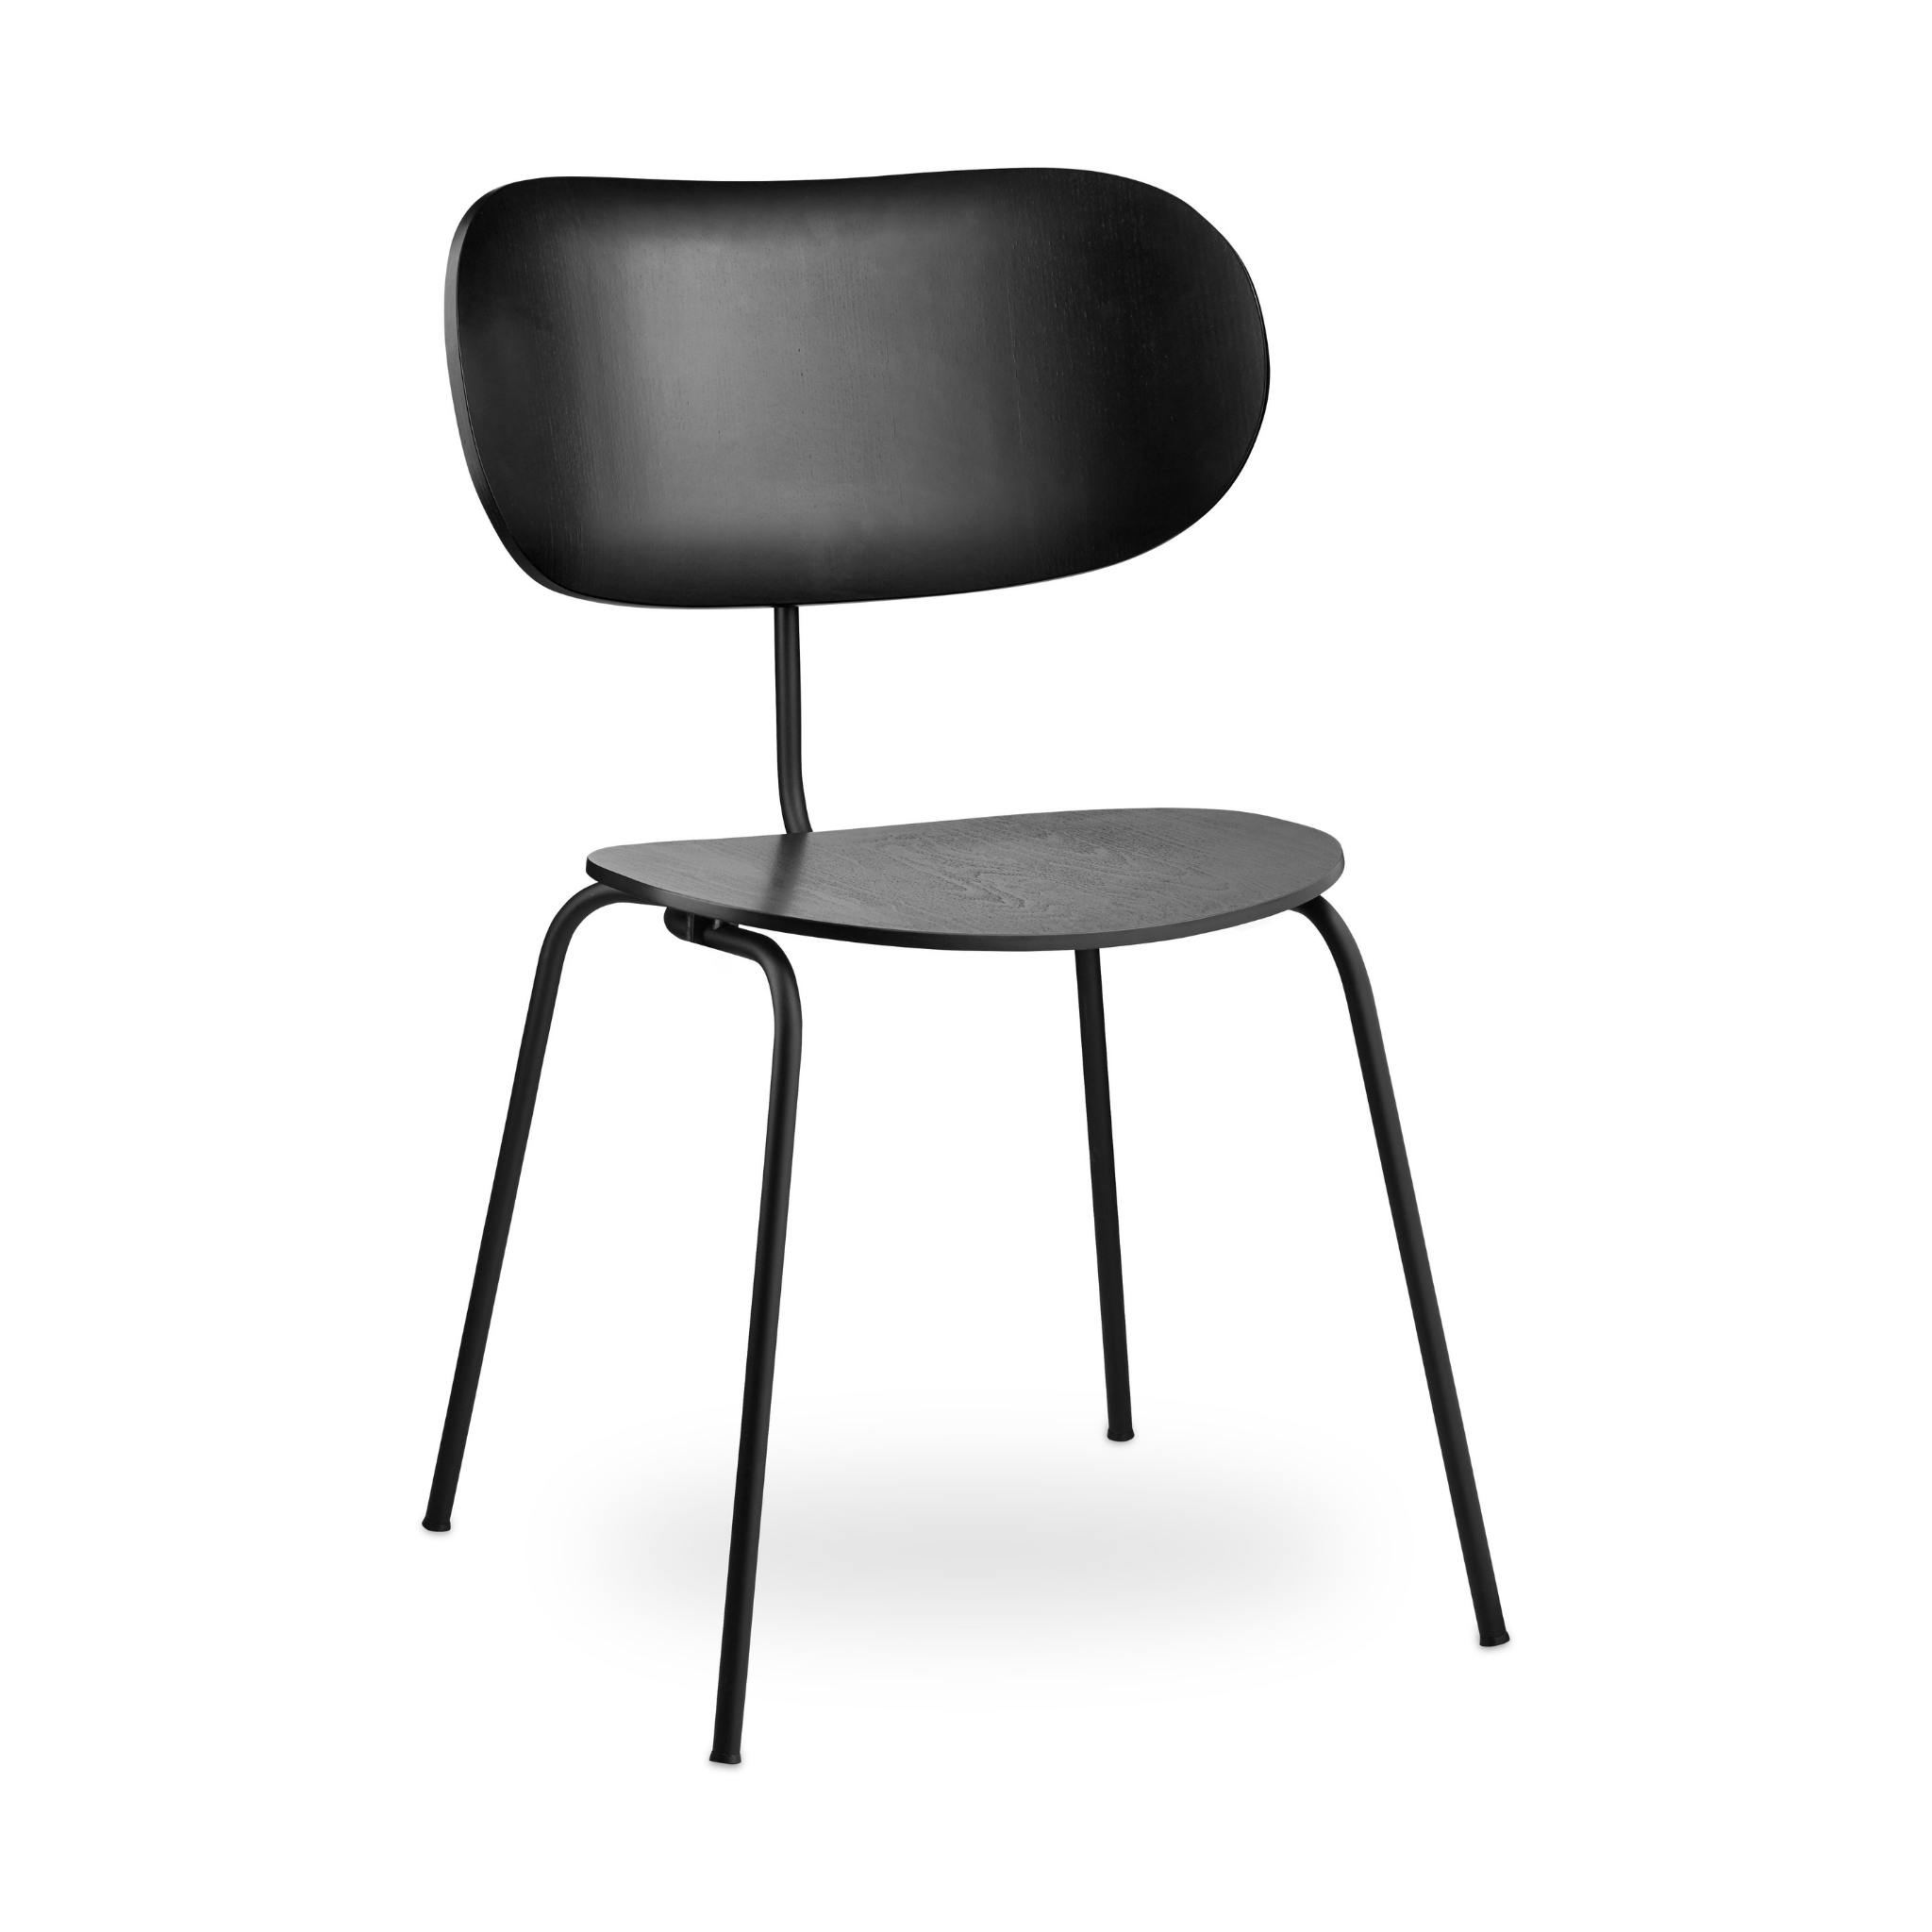 Simple black chair